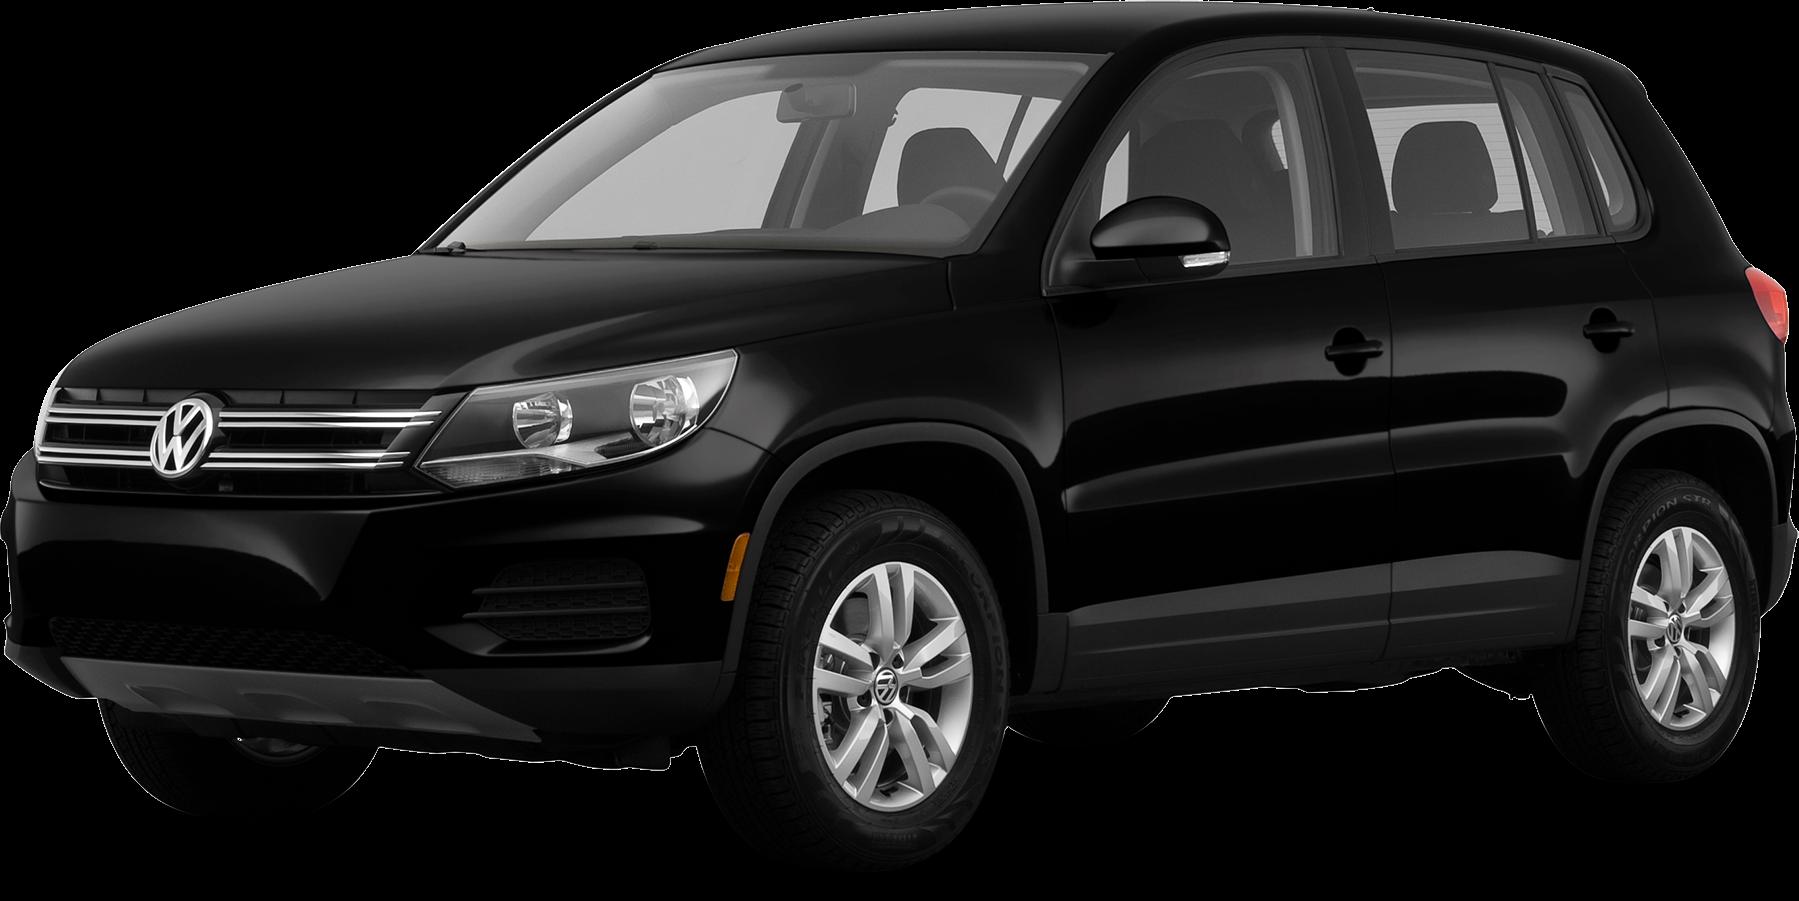 2012 Volkswagen Tiguan Values Cars For Sale Kelley Blue Book